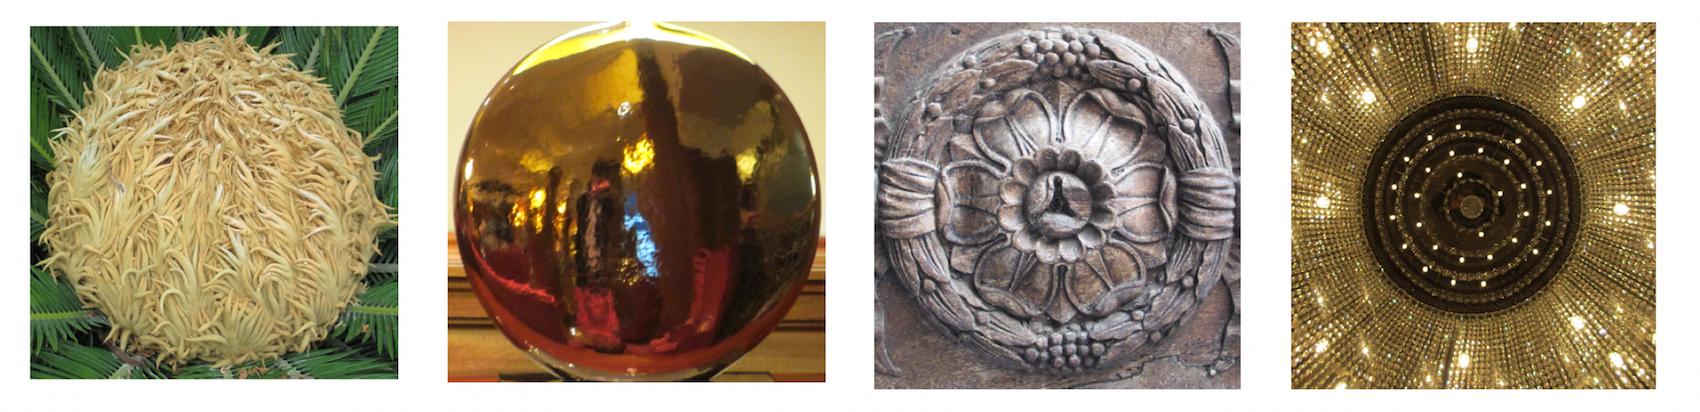 From left: Monaco Mystery, Hilton Paddington Lamp, Nice Stonemasonry, London Chandelier